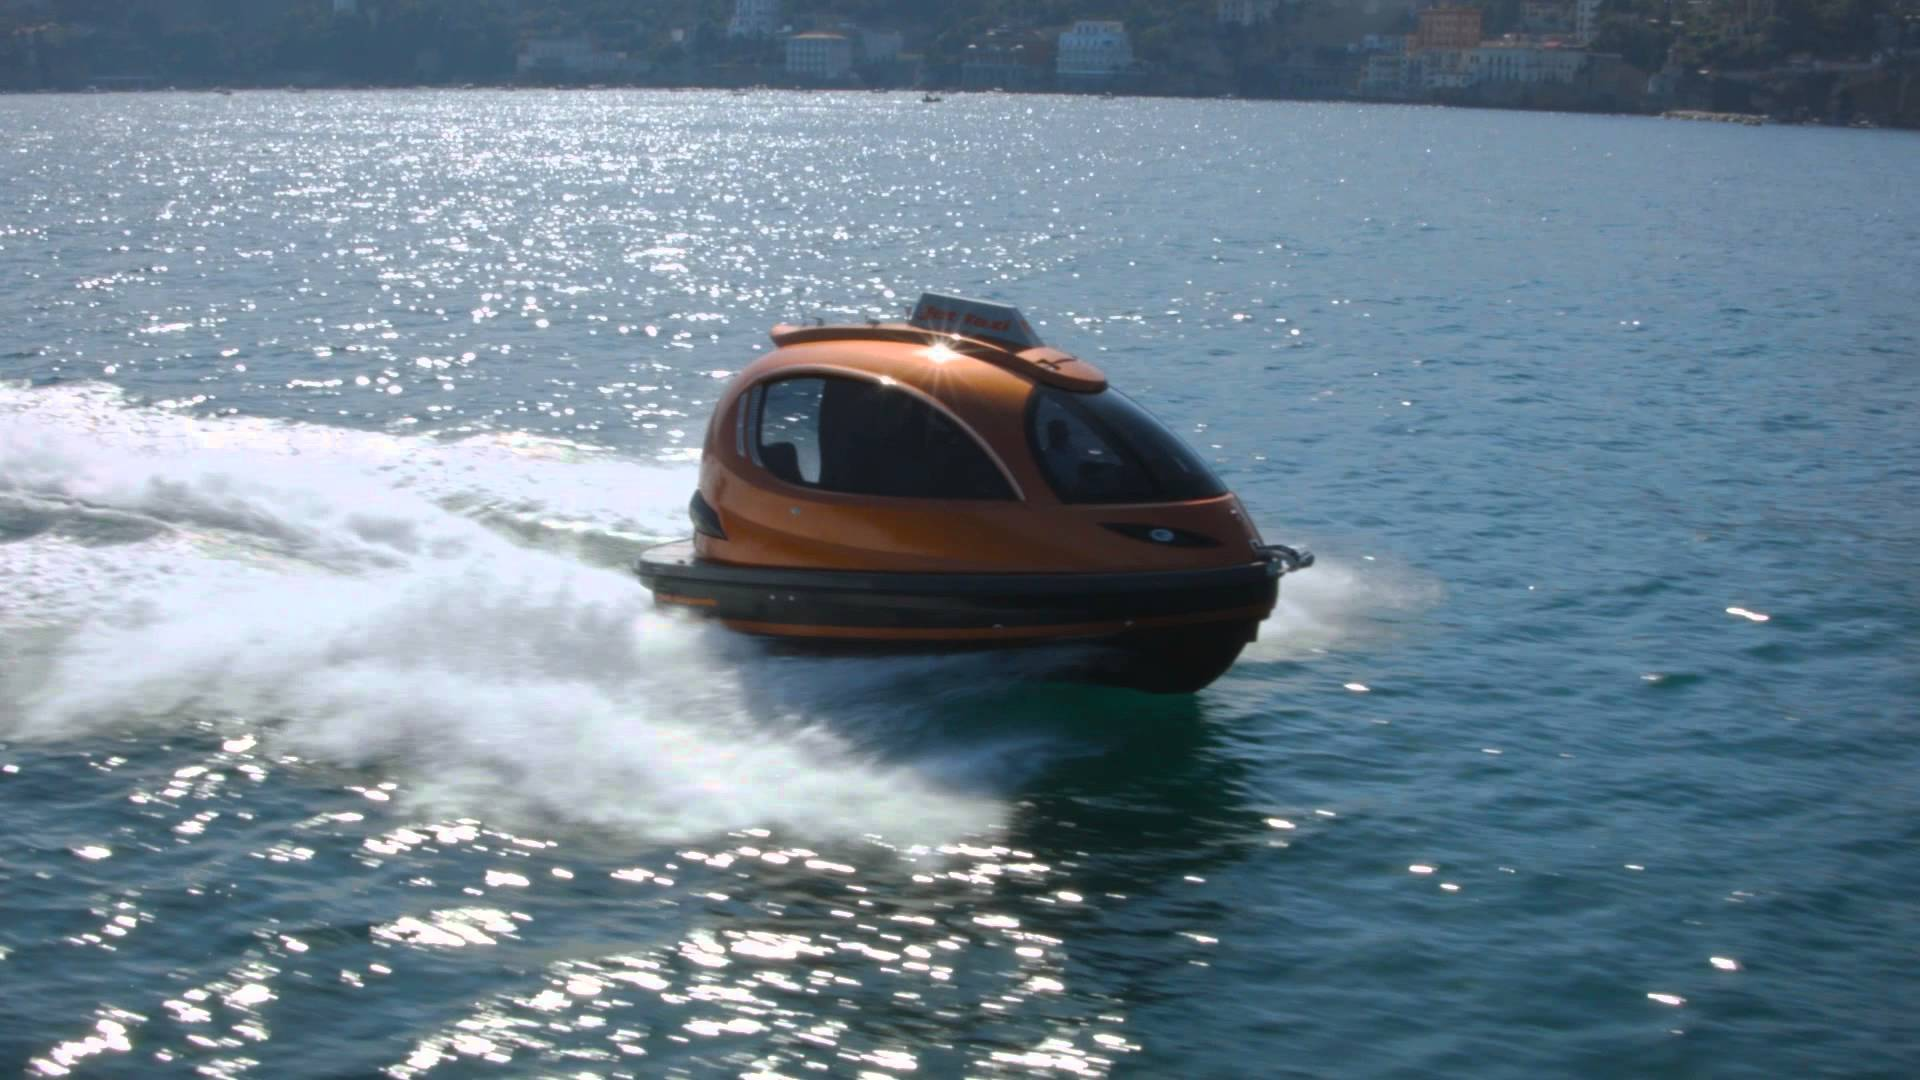 Mini Yacht + Jet Ski=Jet Taxi